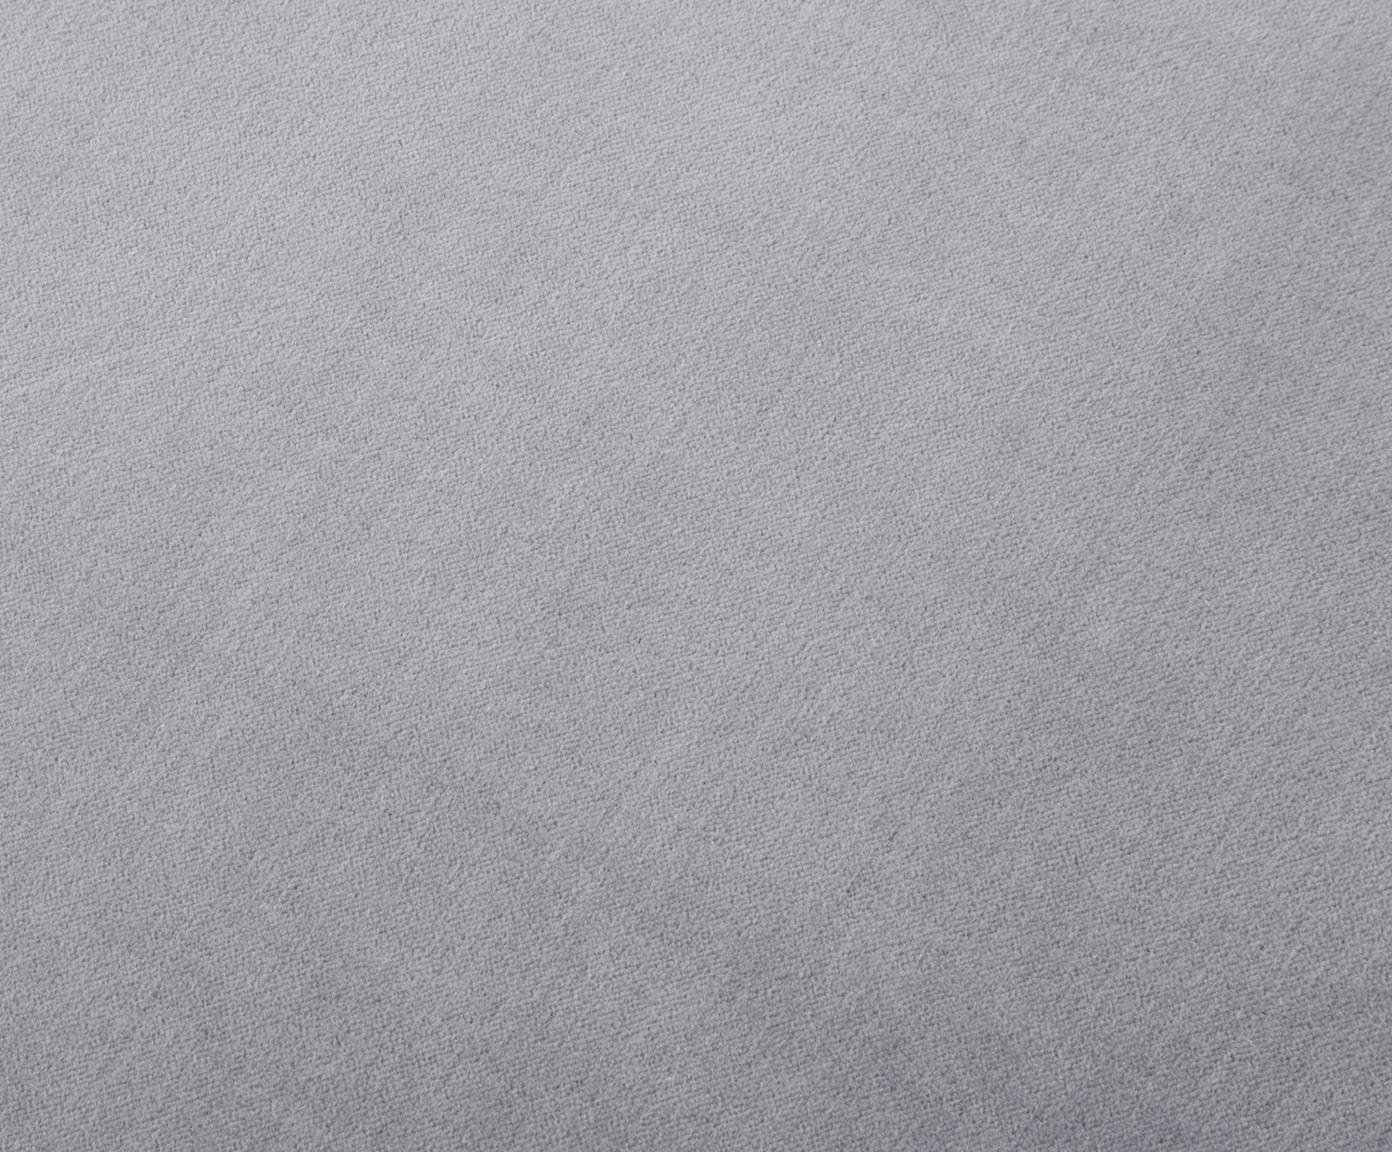 Poef met franjes Adriana, Bekleding: katoen fluweel, Franjes: viscose, Onderzijde: katoen, Lichtgrijs, ∅ 40 x H 40 cm